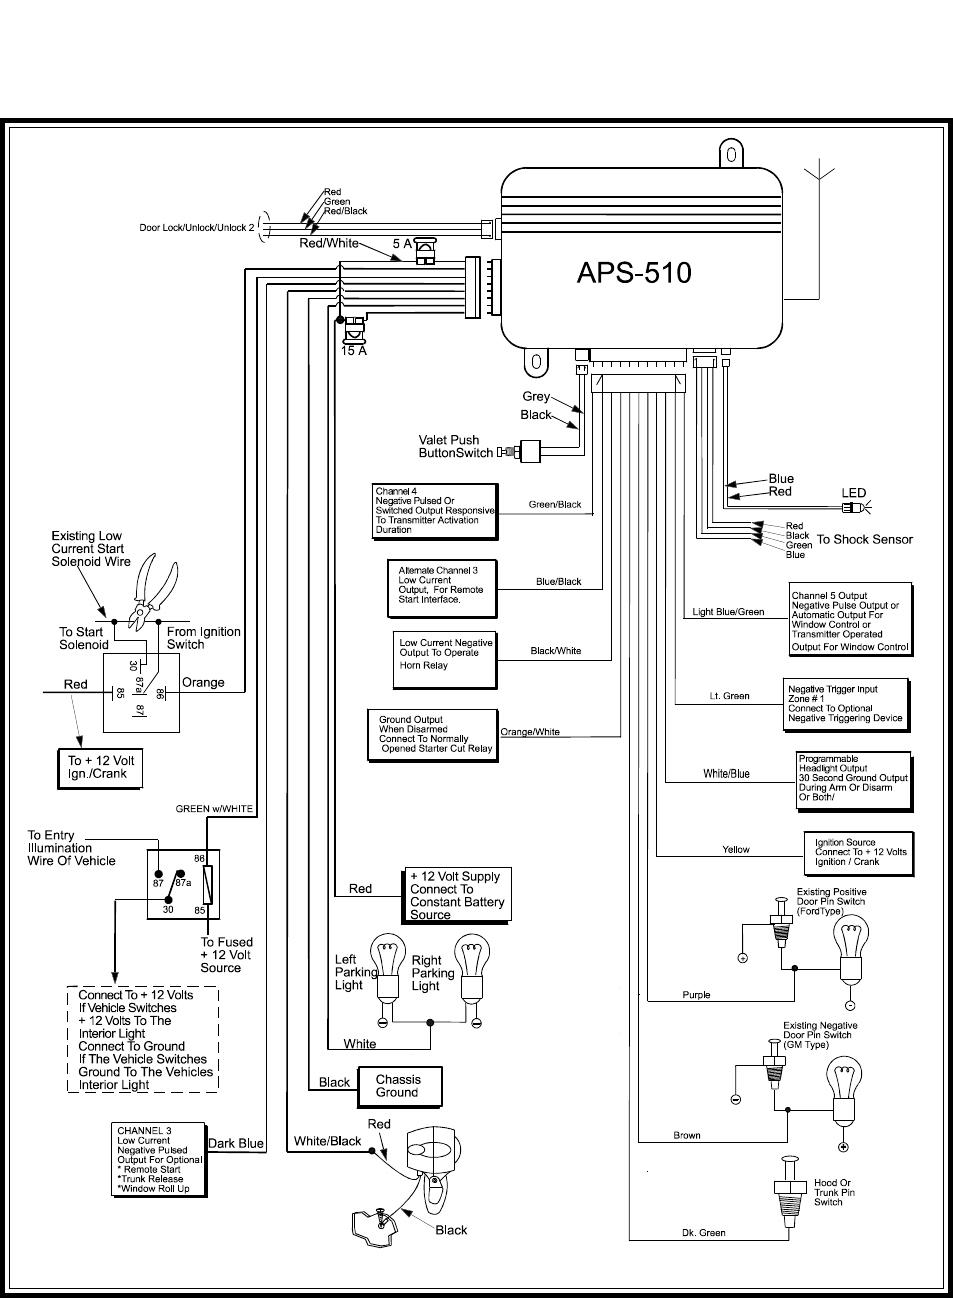 Audiovox Wiring Diagram | Wiring Diagram - Car Alarm Wiring Diagram